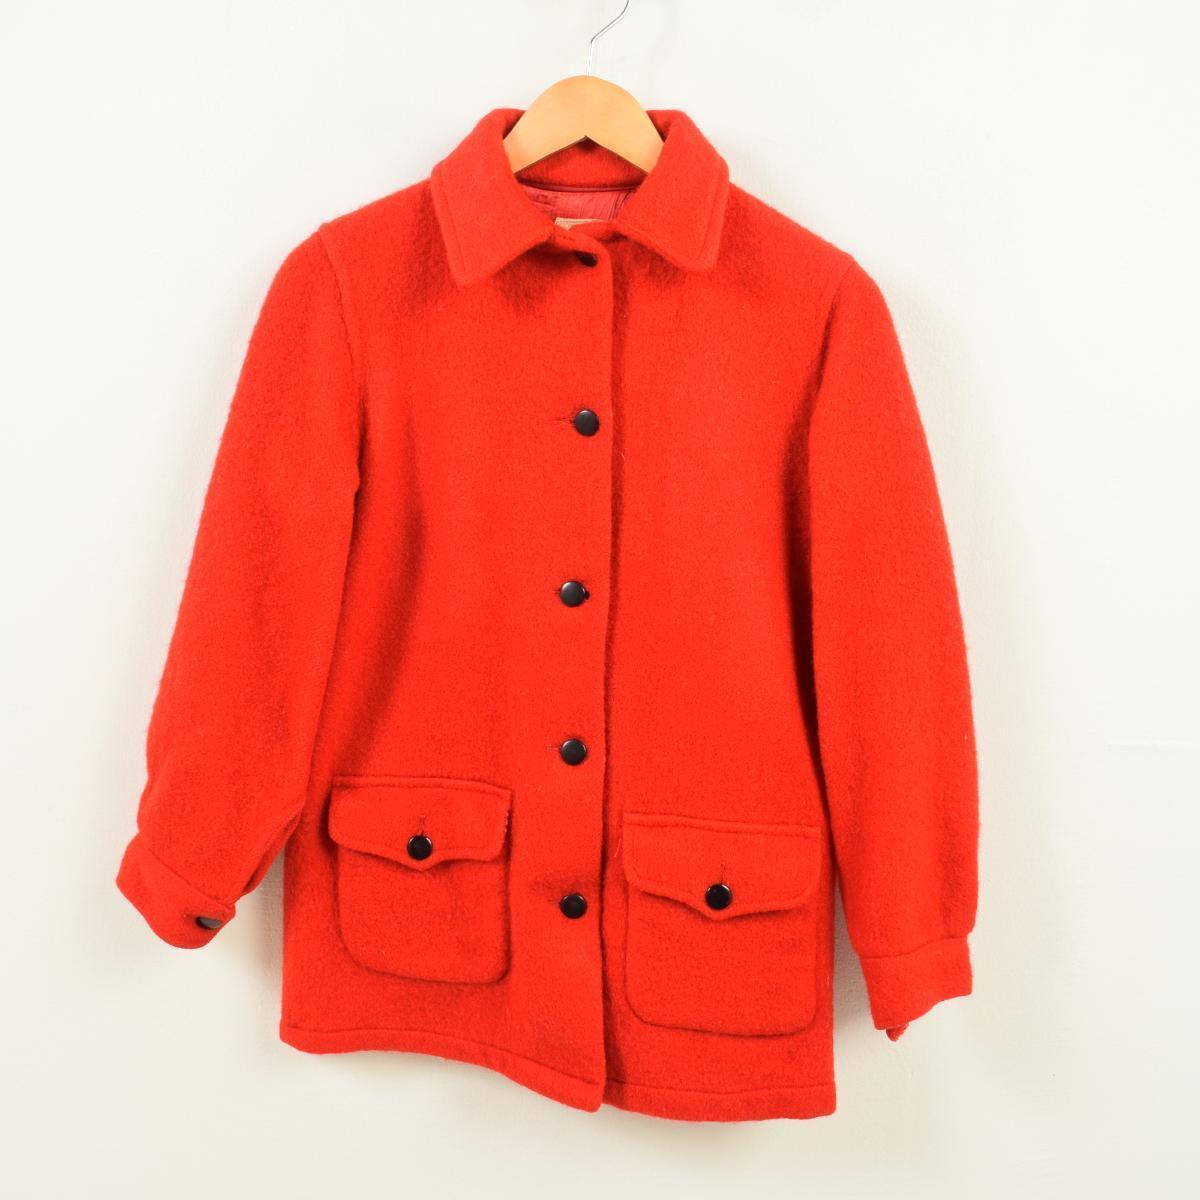 HUDSON'S BAY ウールジャケット レディースXS ヴィンテージ /waw7488 【中古】 【181123】